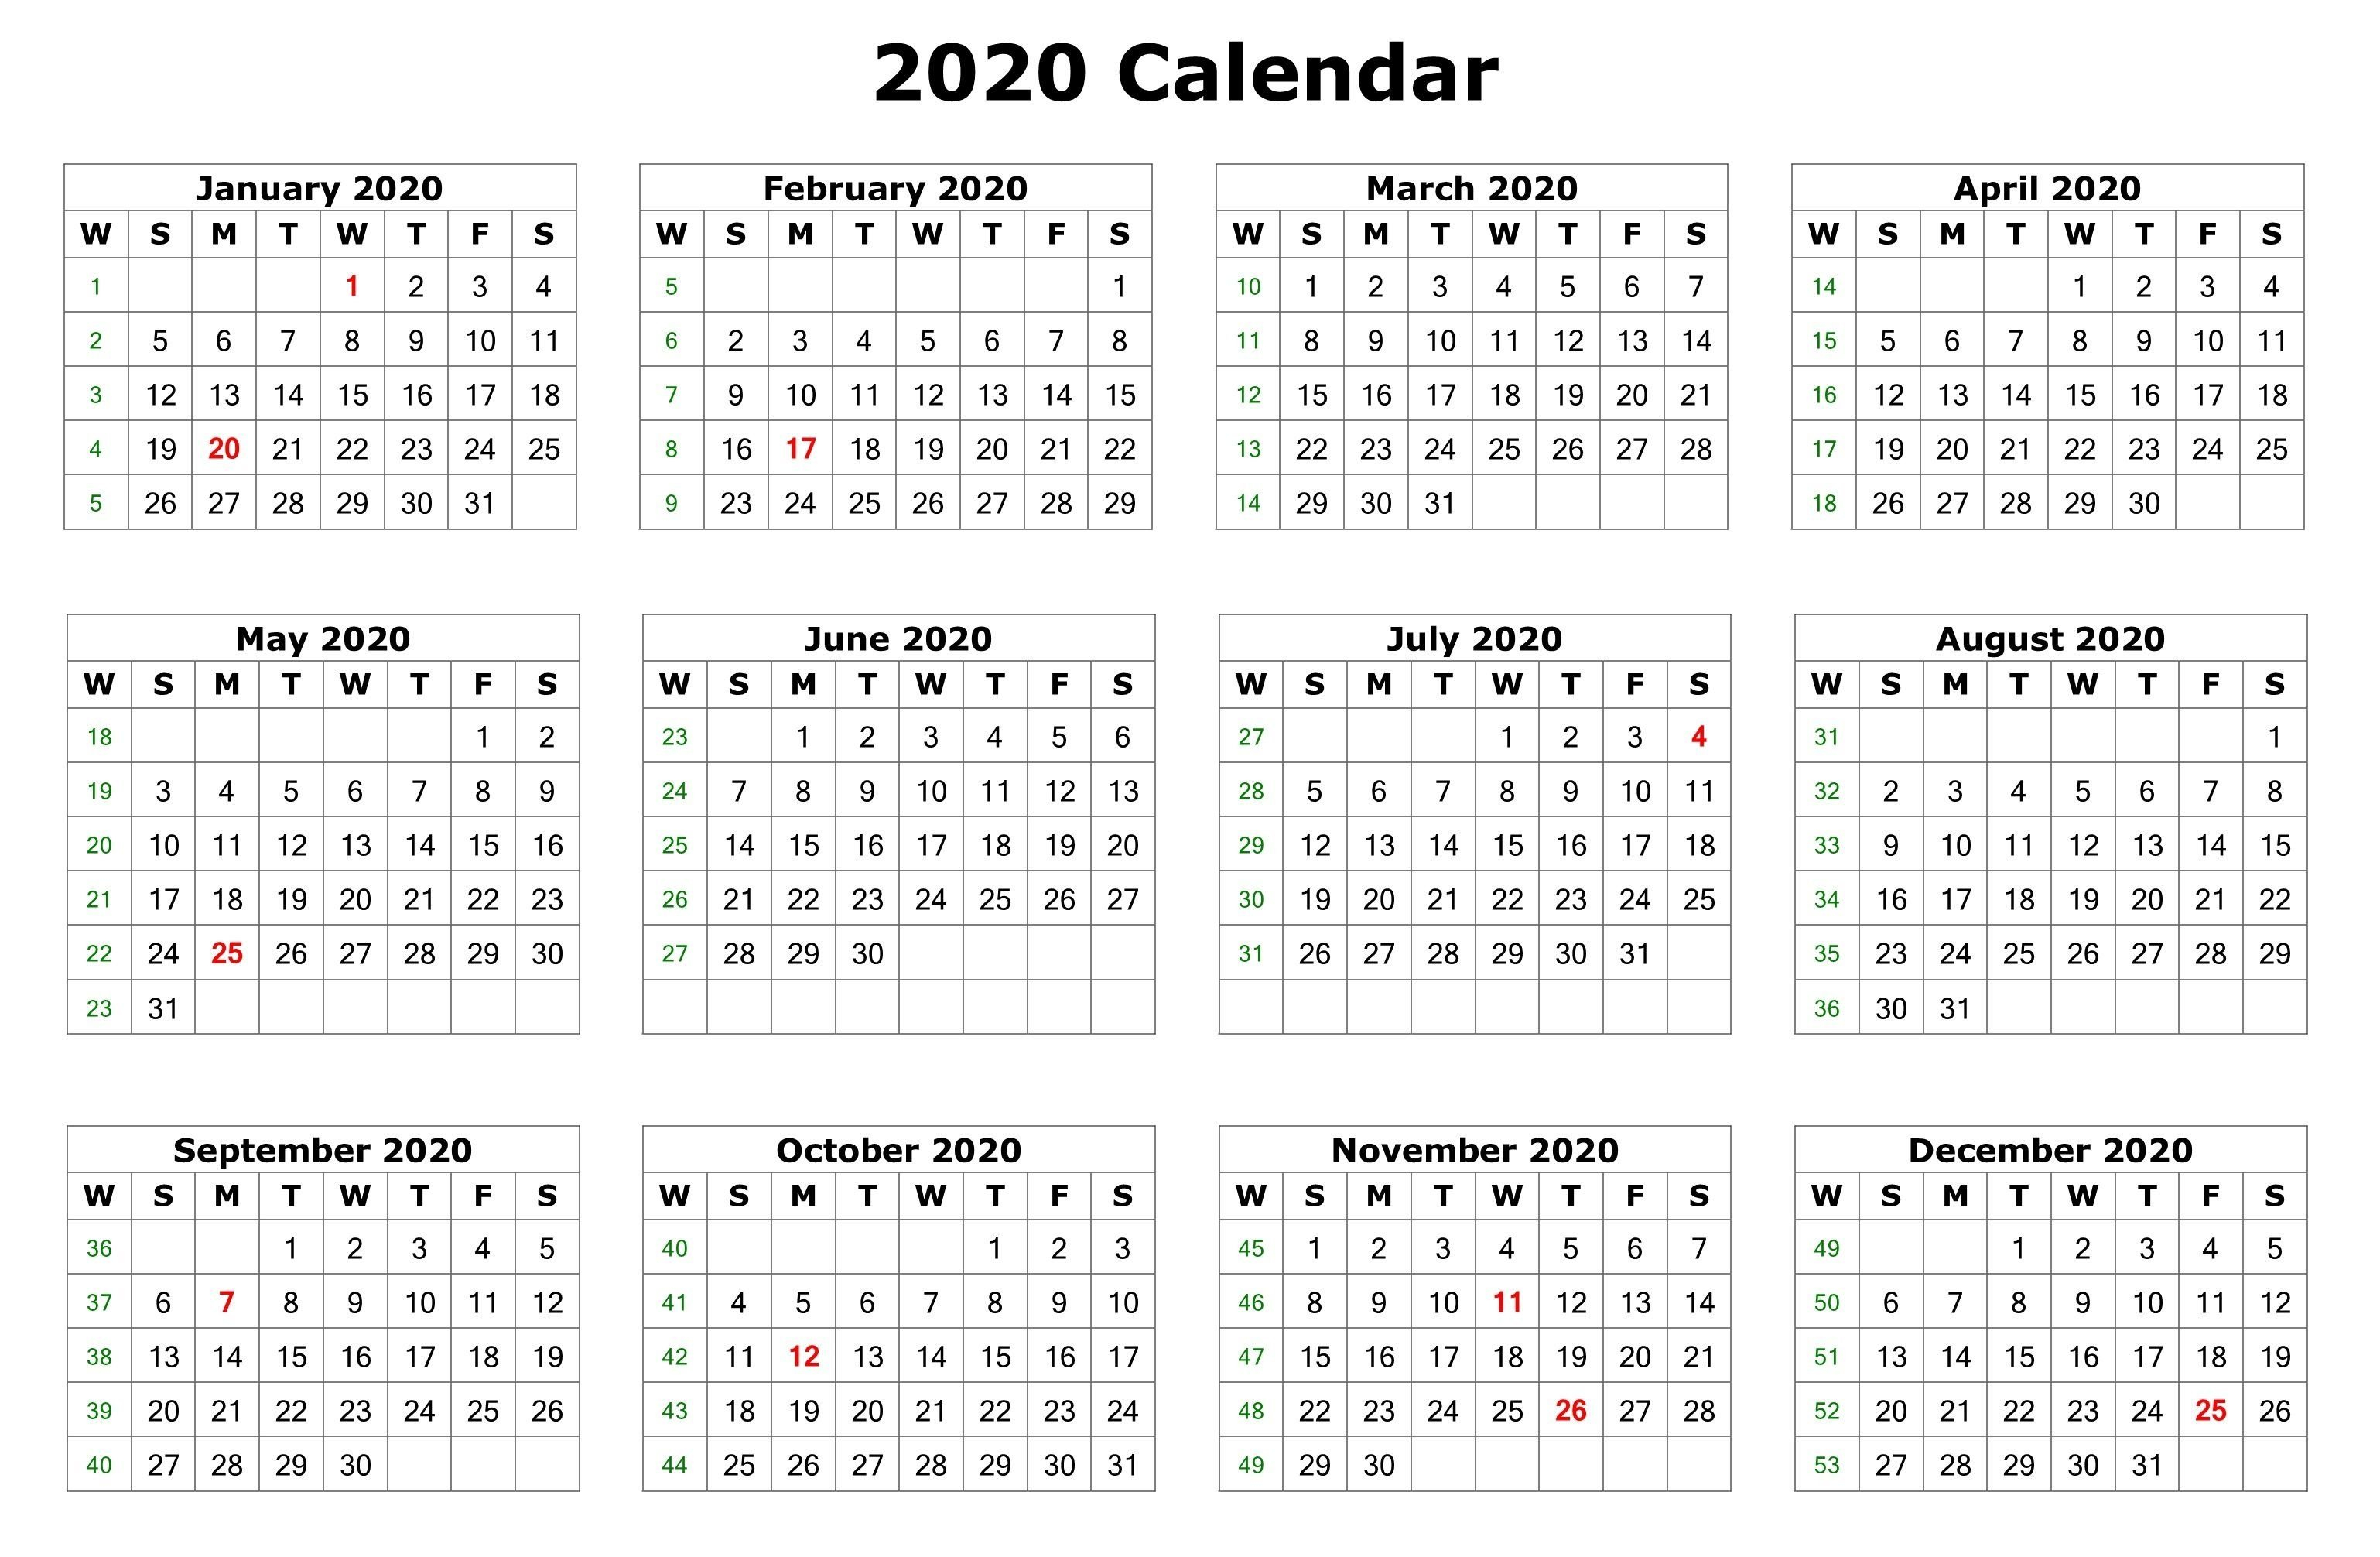 2020 One Page Calendar Printable | Calendar Printables Printable Multi Year Calendars On One Page